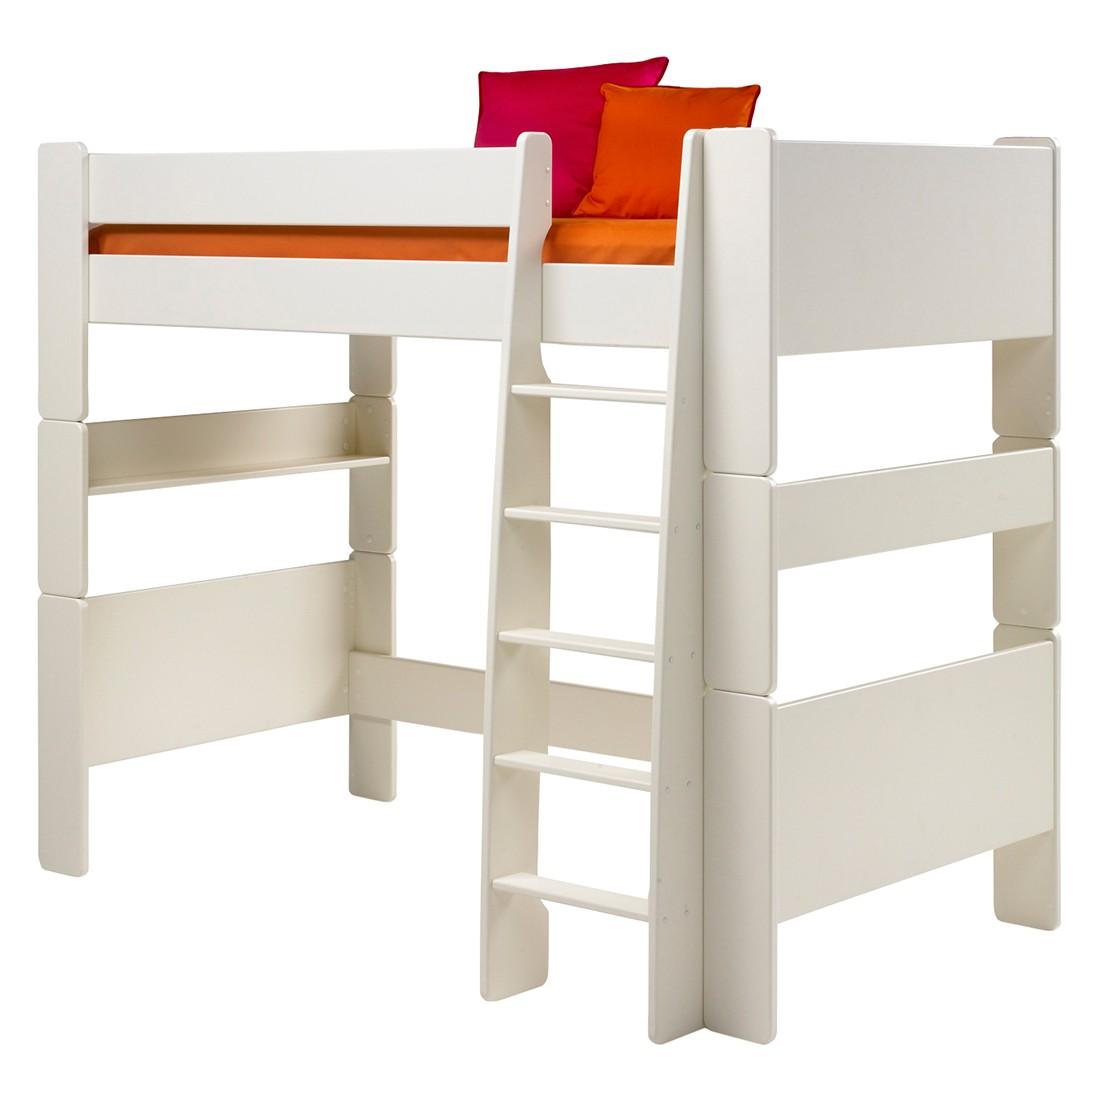 Lit mezzanine Steens for Kids I - Panneau MDF, vernis blanc, Steens